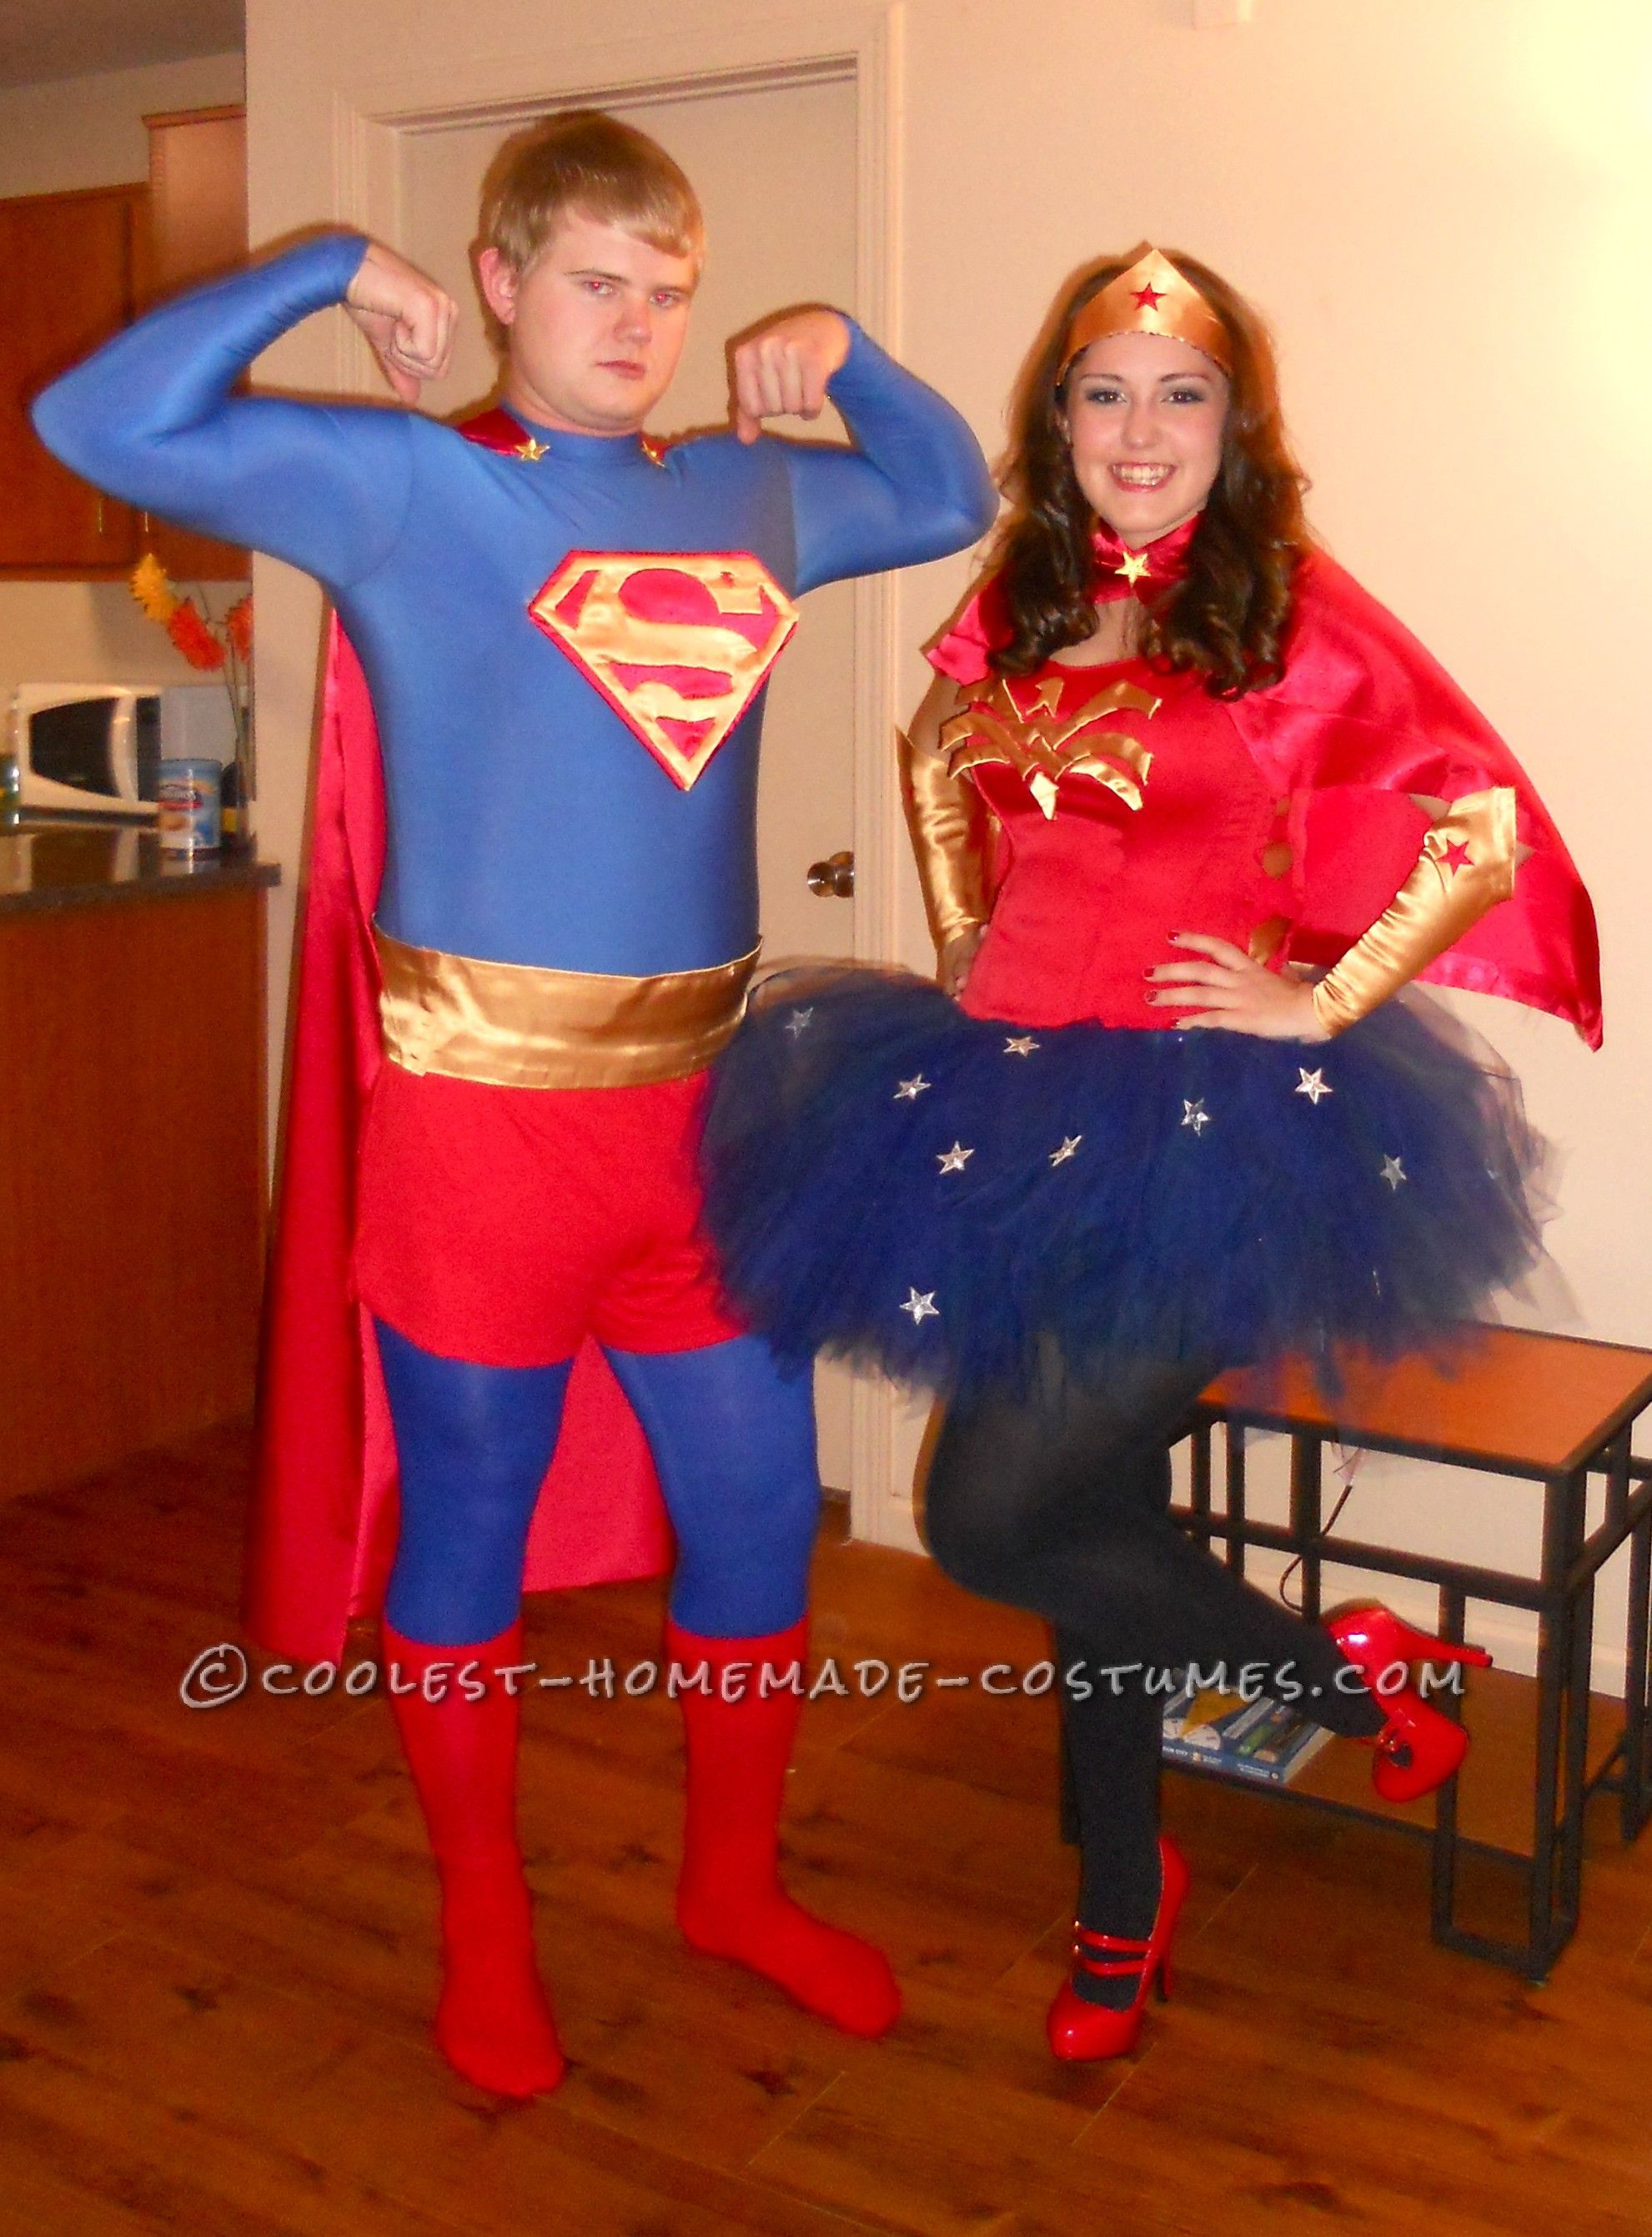 Mickey and Minnie Costume | Halloween costume contest, Costume ...